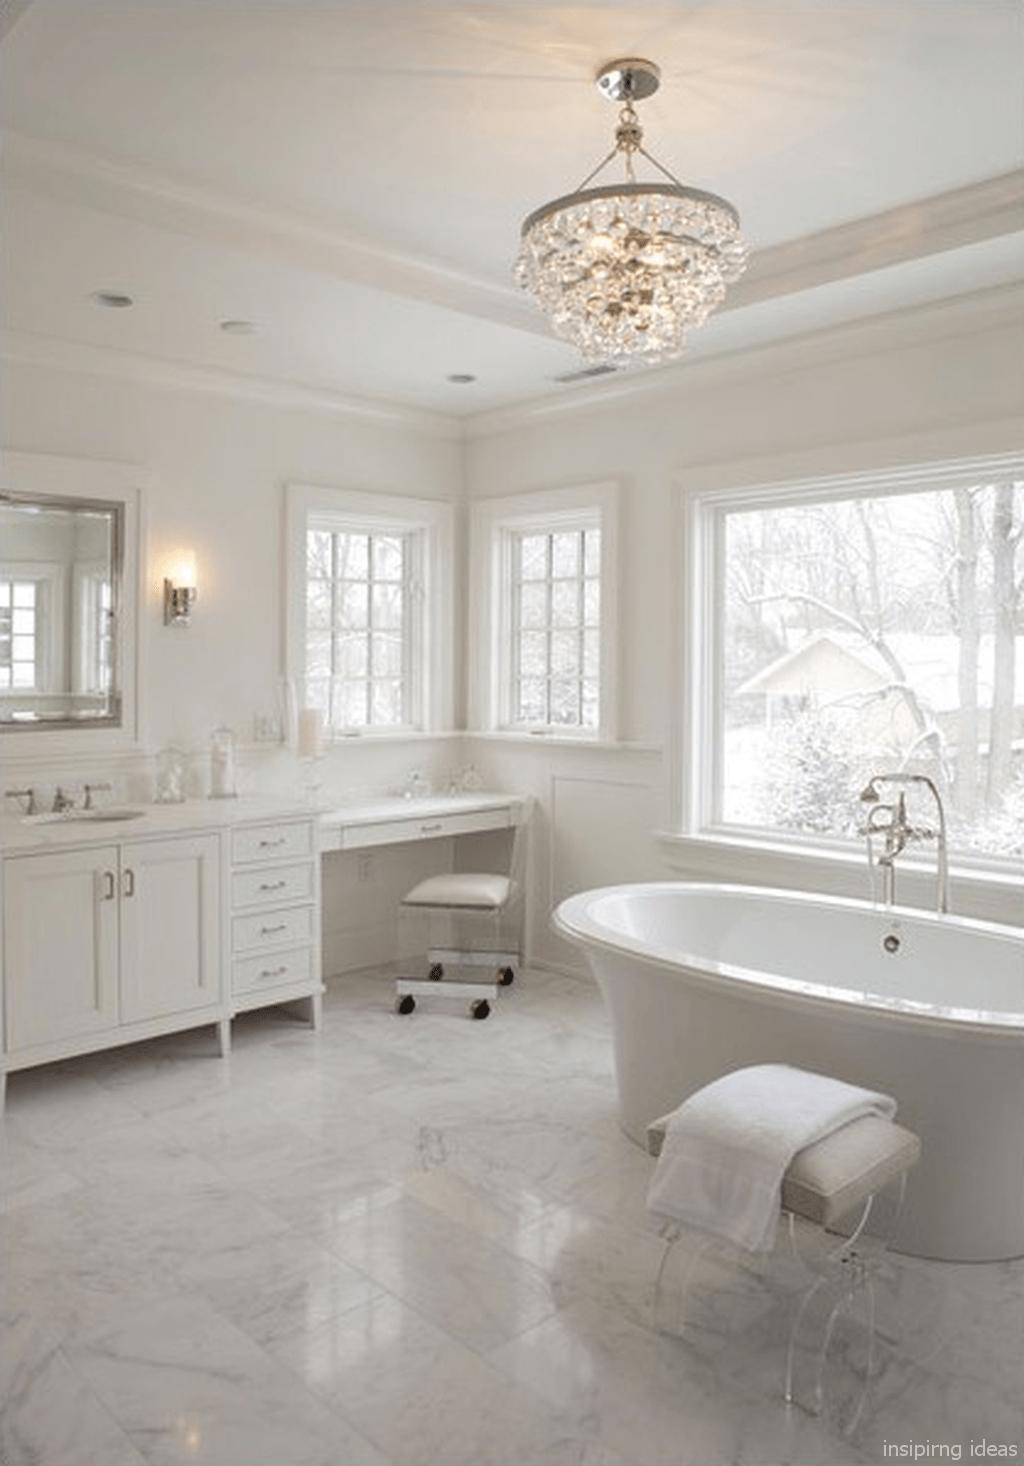 63 Awesome Modern Farmhouse Bathroom Vanity Ideas (With